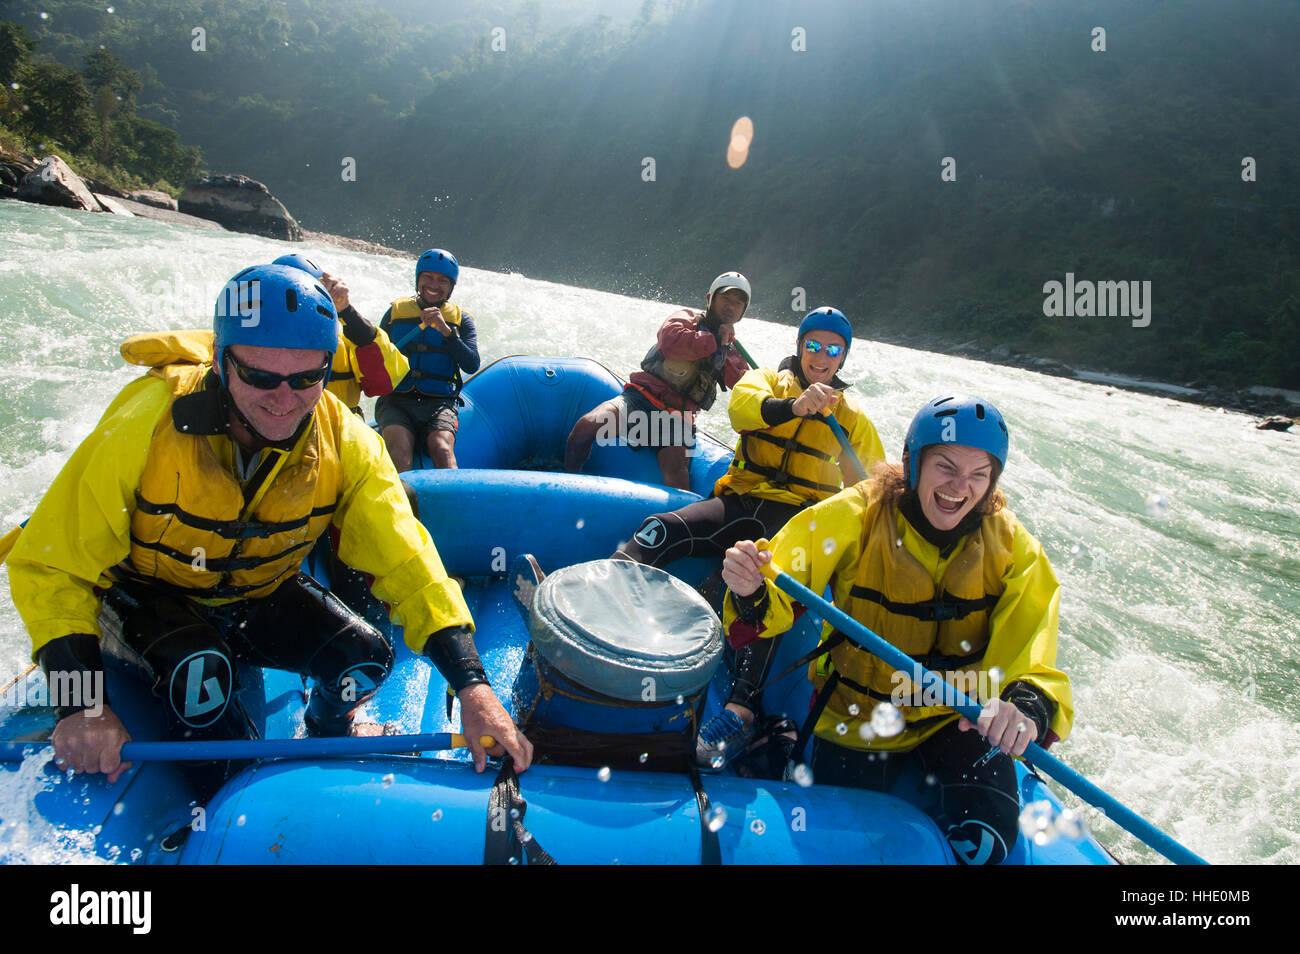 Rafting trip on the Trisuli River, Nepal Stock Photo